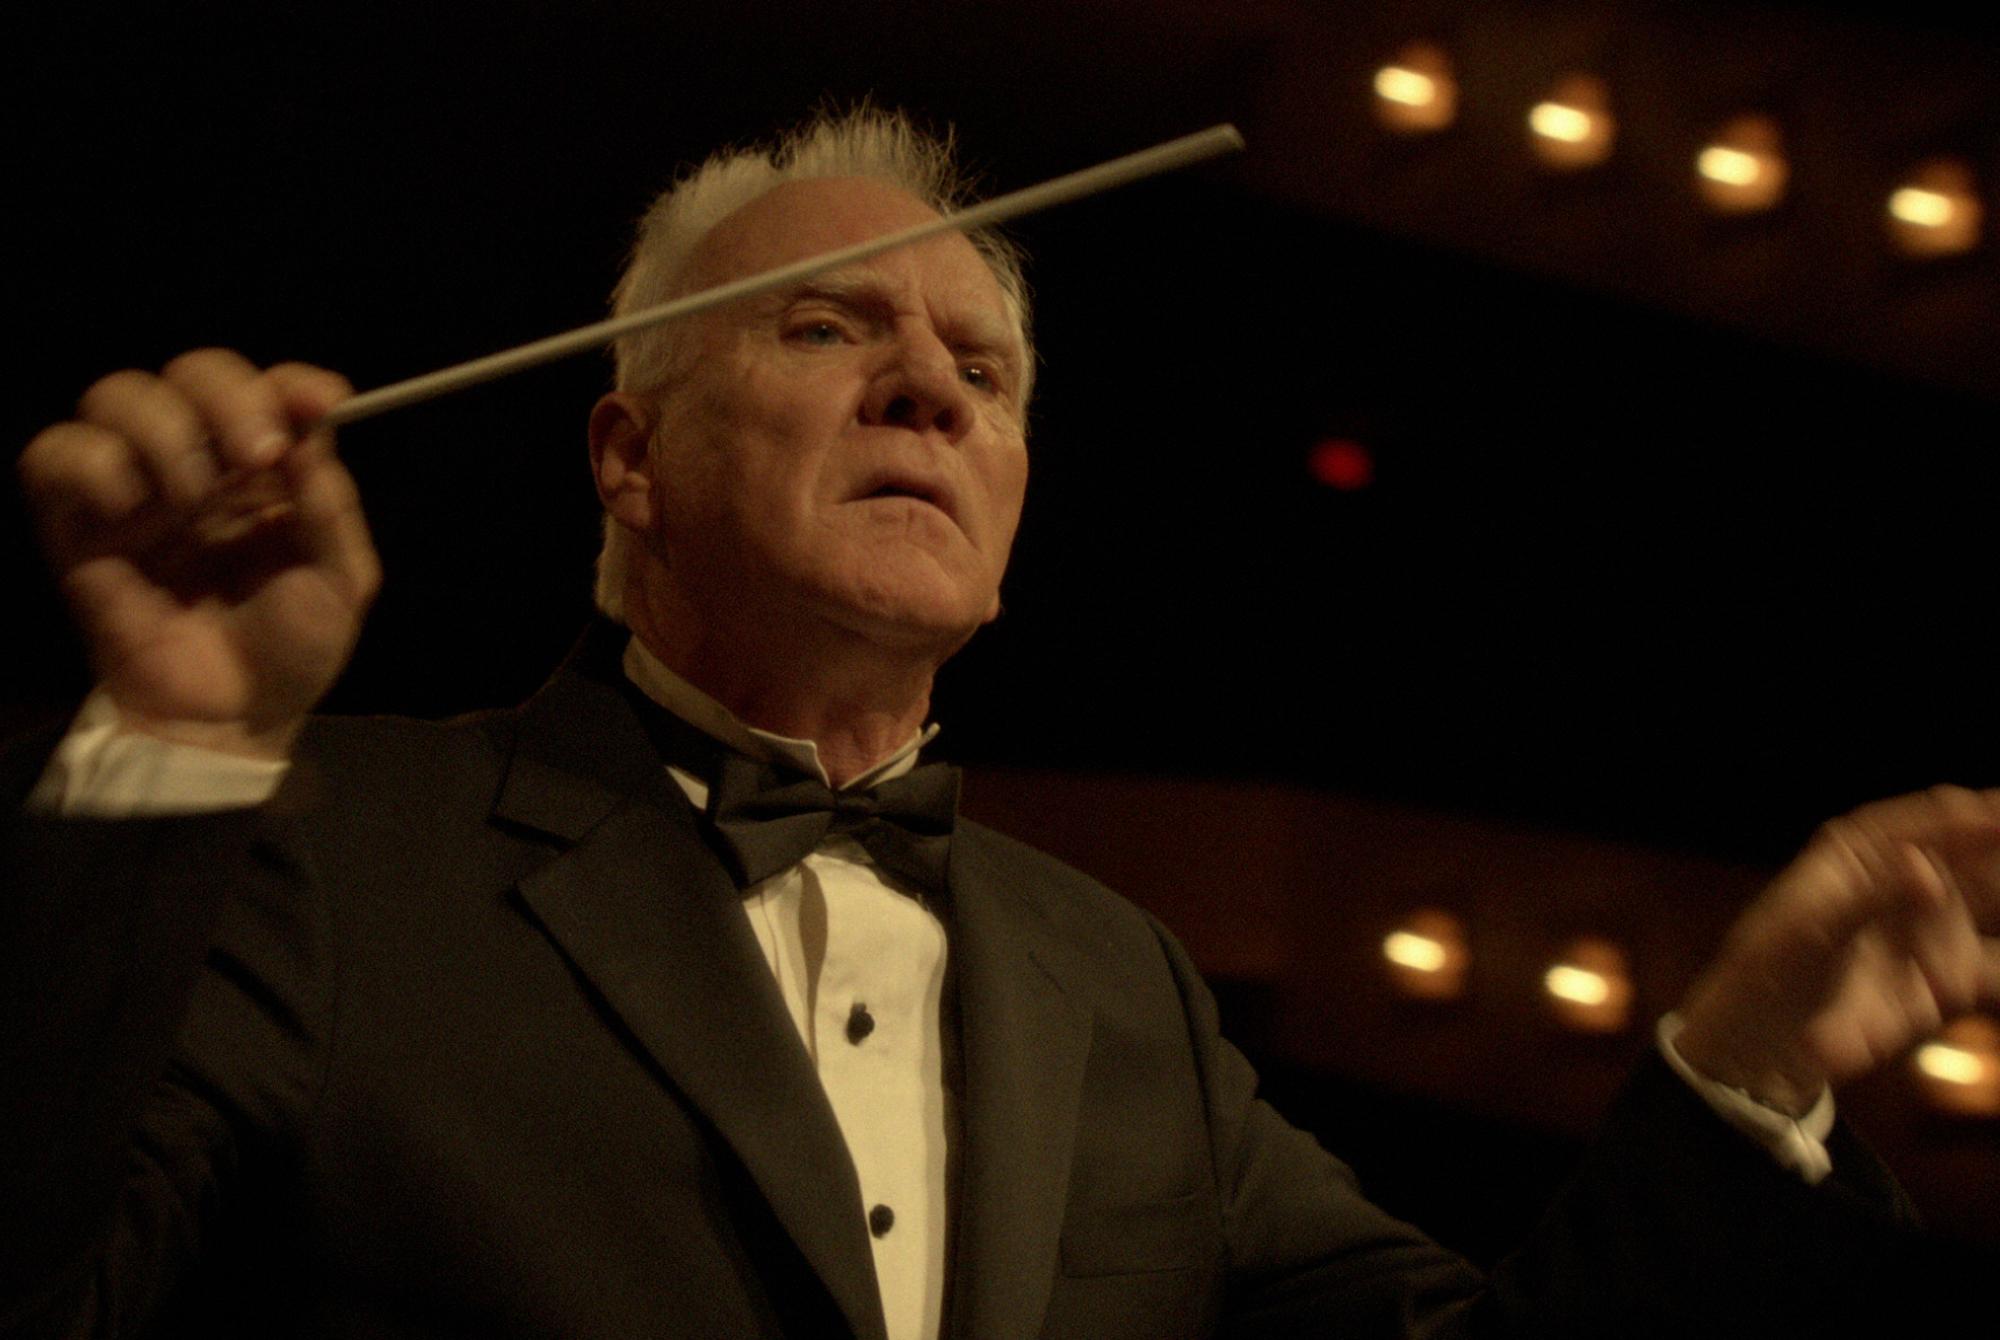 Mozart in the Jungle: Malcolm McDowell in versione direttore d'orchestra